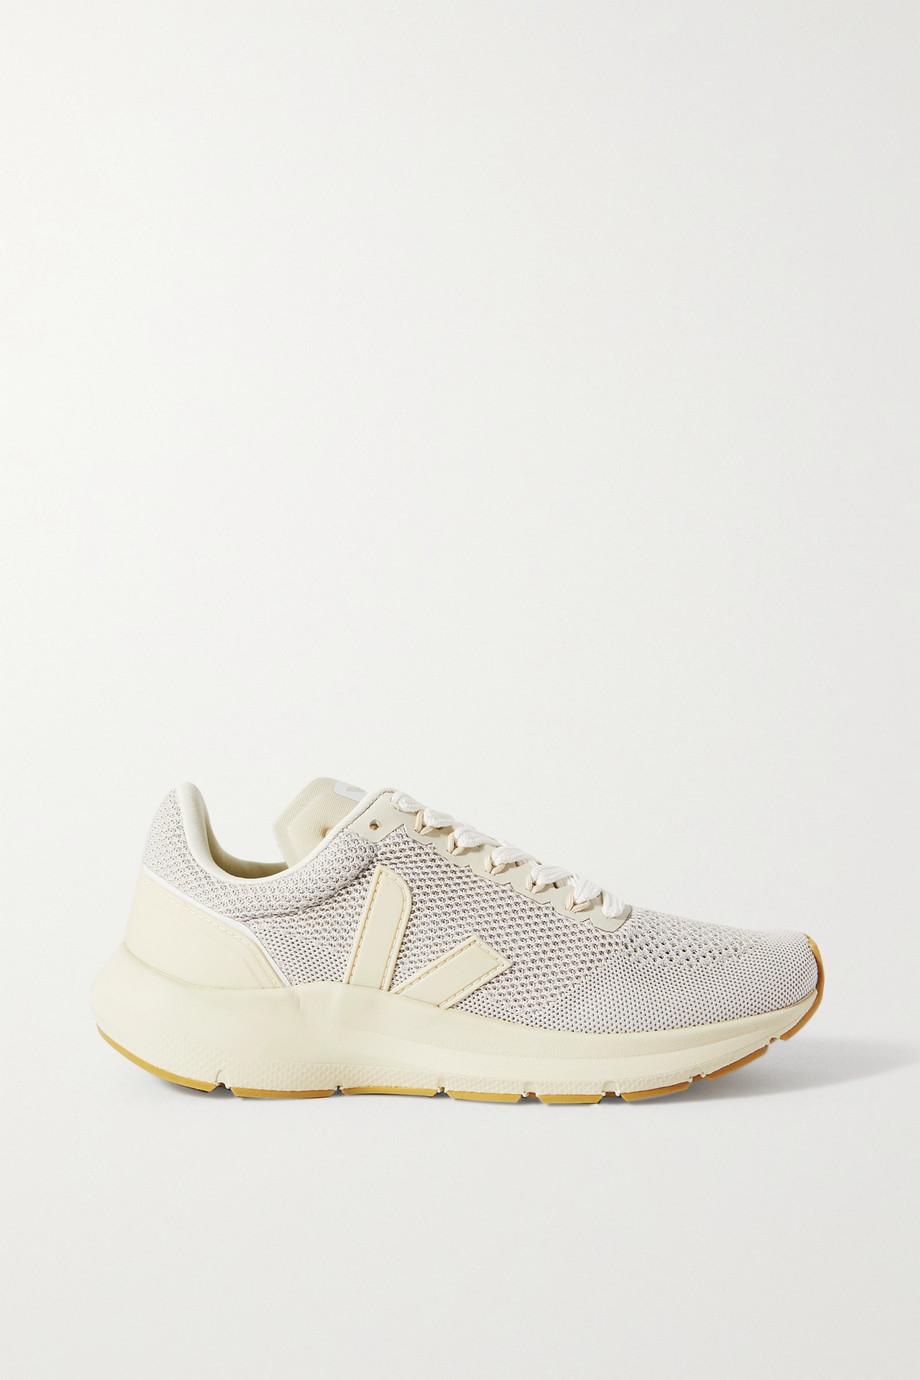 Veja Marlin V-knit sneakers